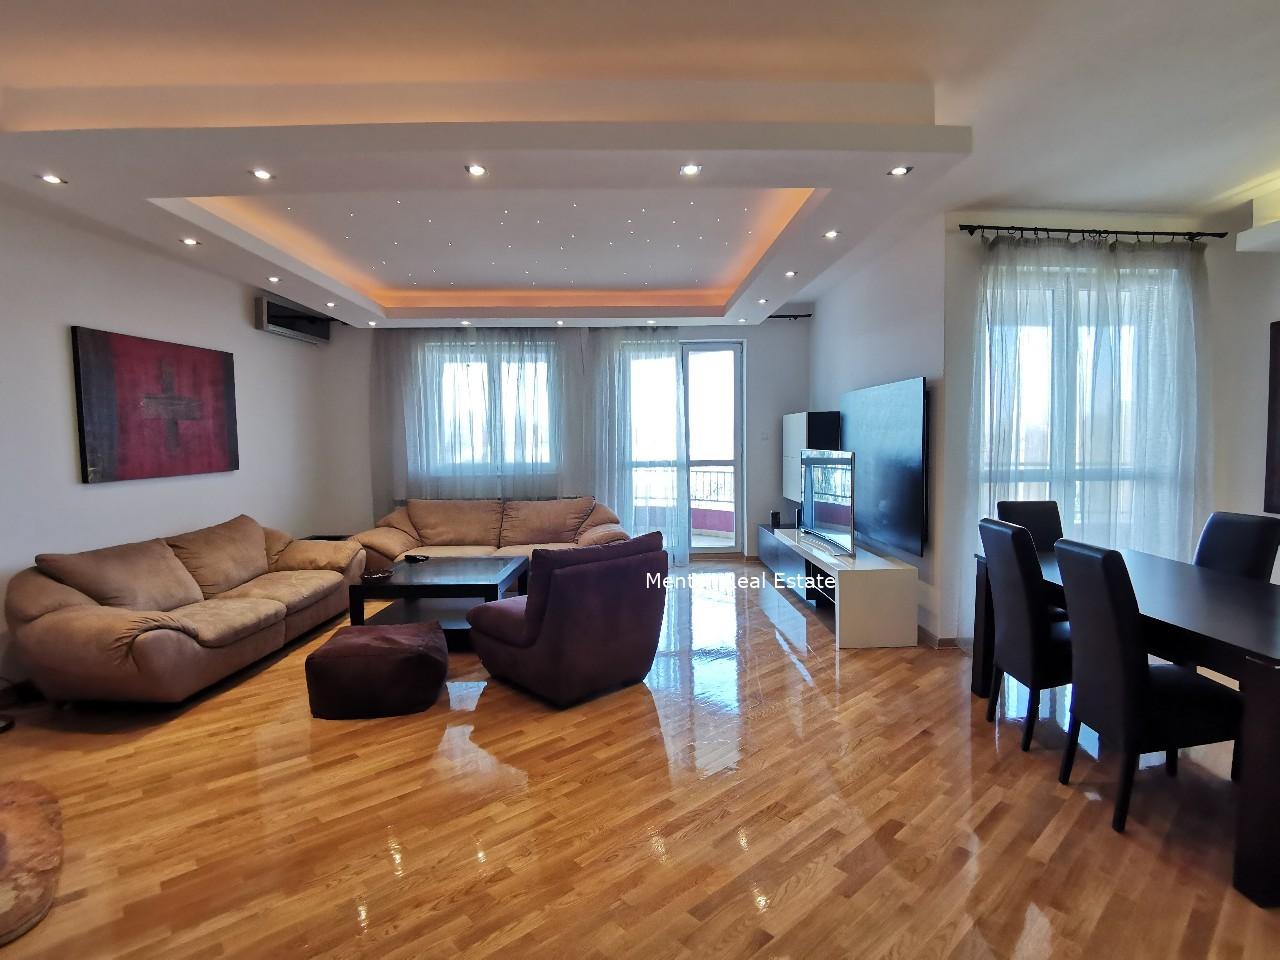 Vračar 160sqm apartment for rent